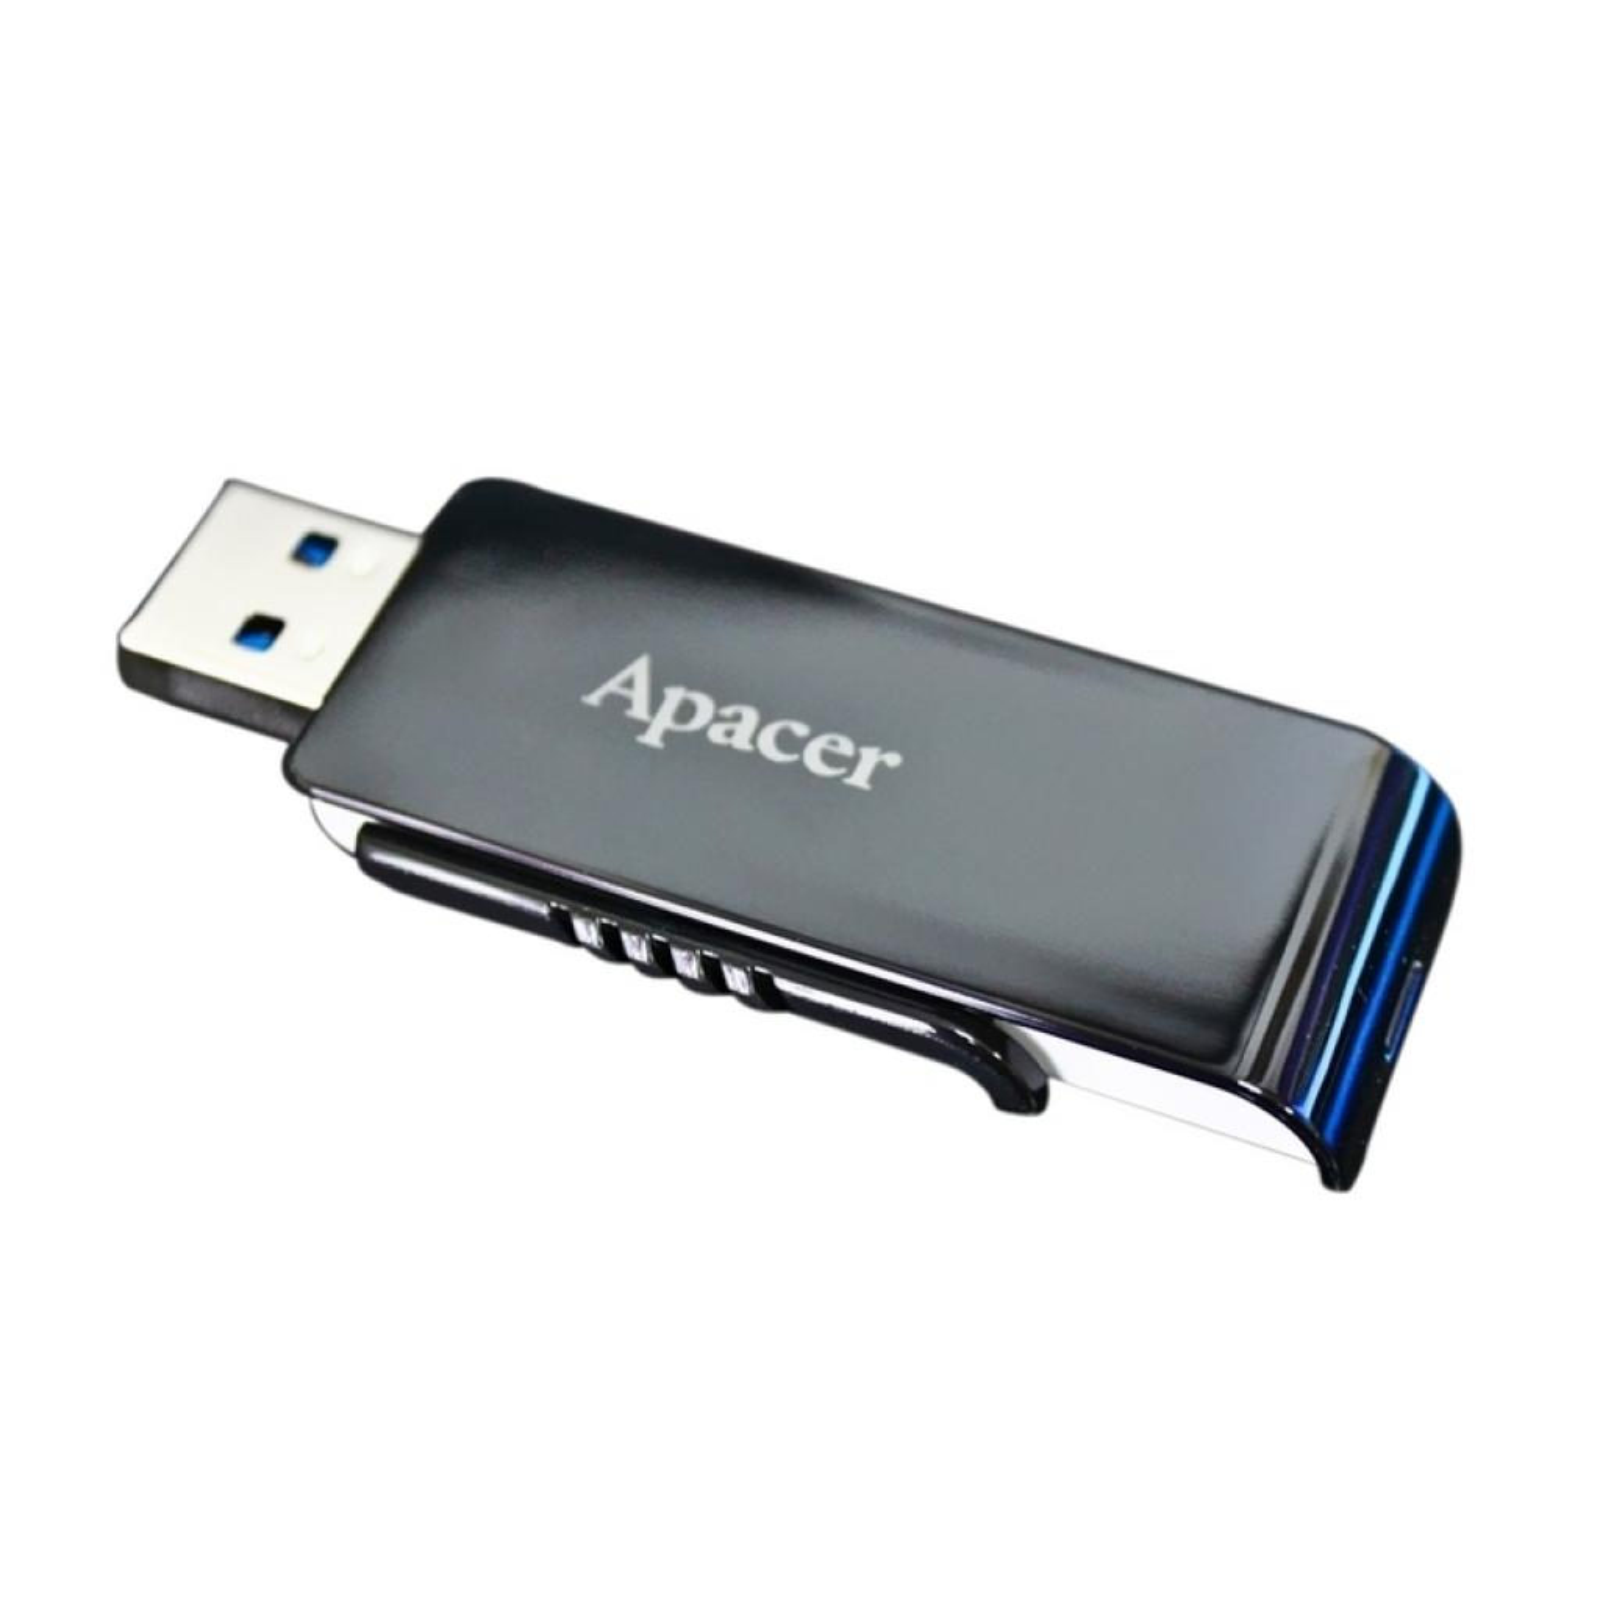 USB флеш накопитель 16GB AH350 Black RP USB3.0 Apacer (AP16GAH350B-1) изображение 9